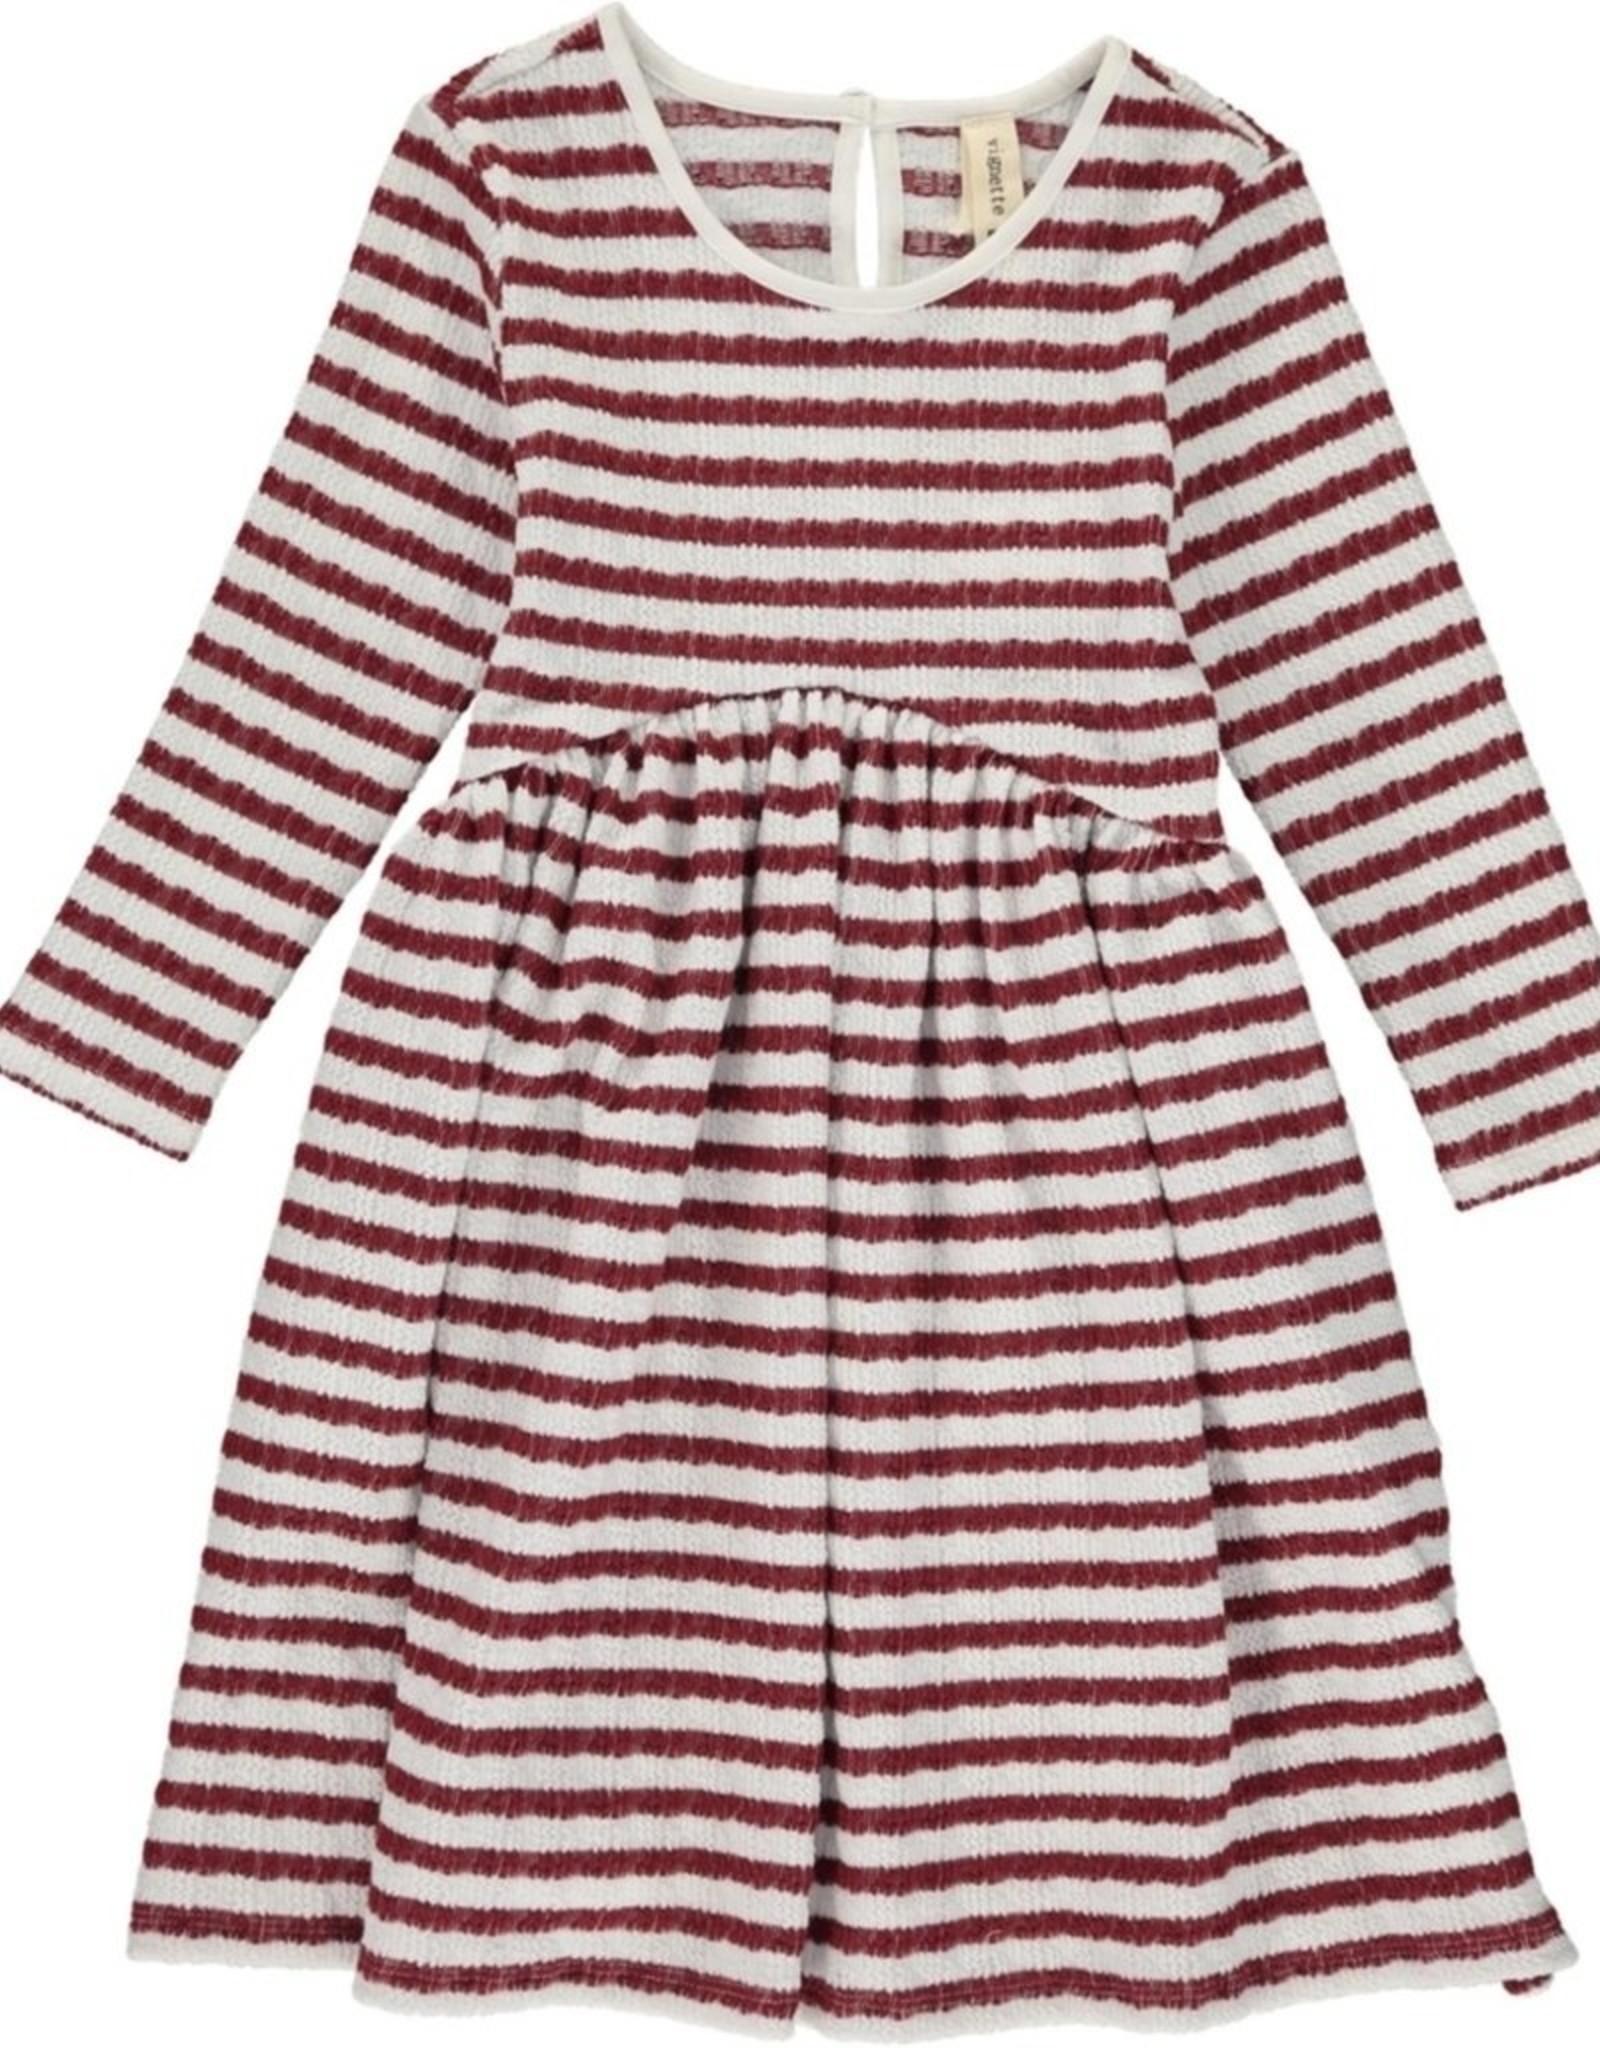 Vignette Charlie Dress, Burgundy Stripe